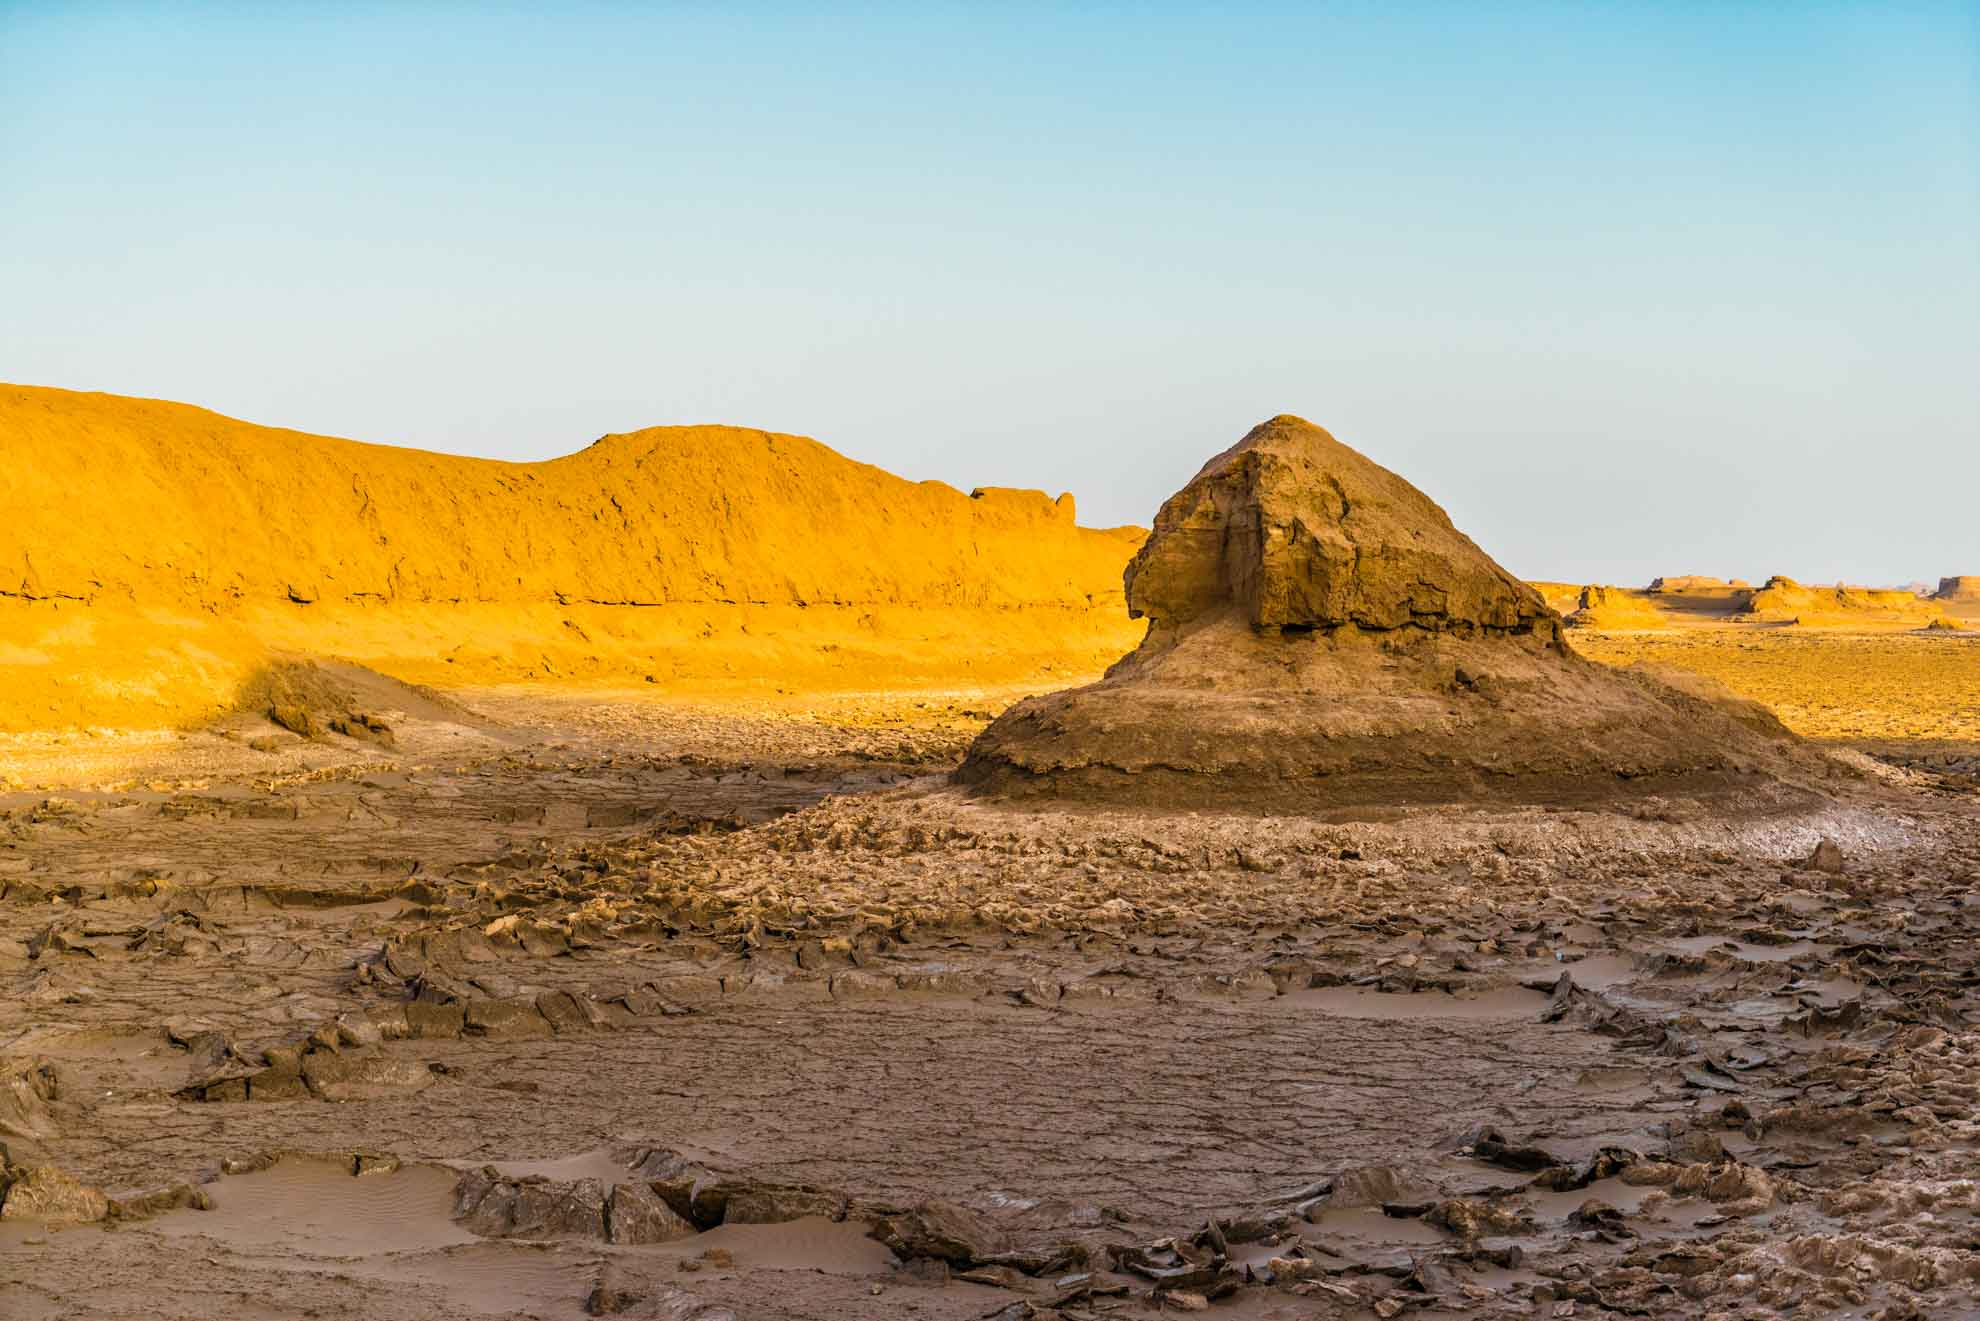 Kaluts desert sphynx, kerman, iran, pescart, photo blog, travel blog, blog, photo travel blog, enrico pescantini, pescantini